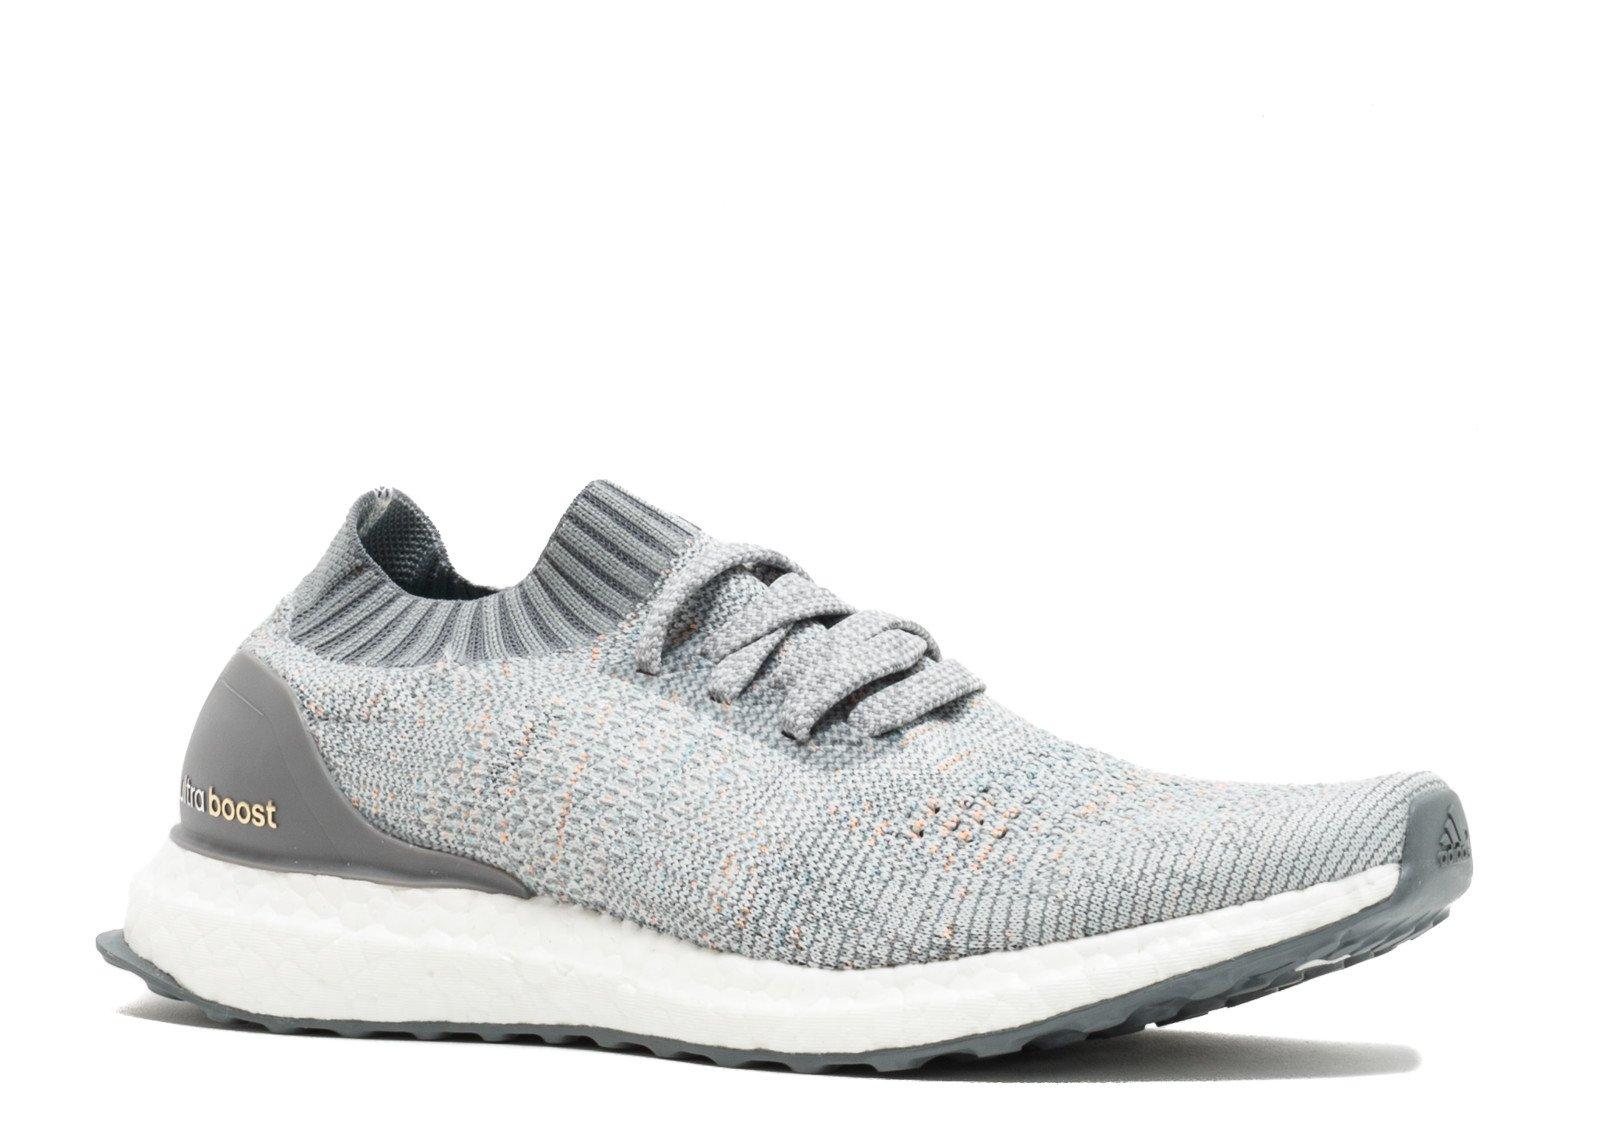 71EYhSFiMOL - adidas Men's Ultraboost Uncaged Running Shoe (Grey)